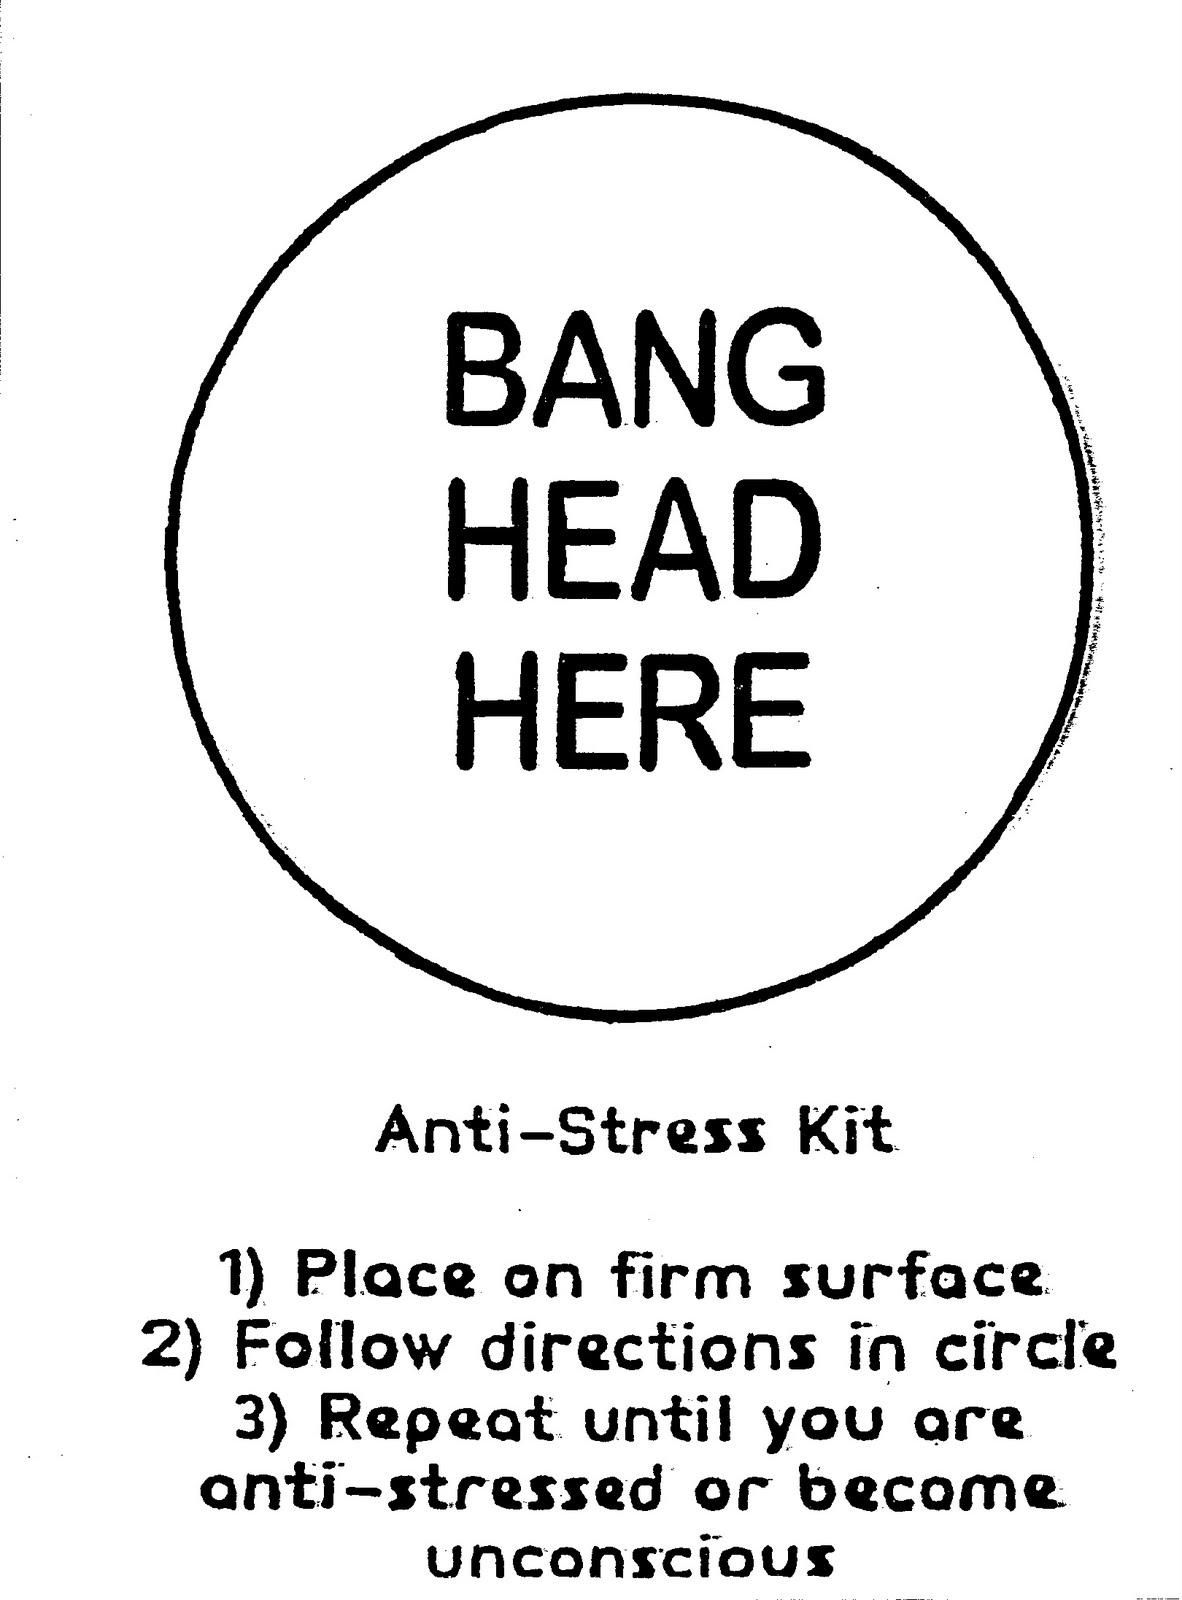 Stress Treatment Kit